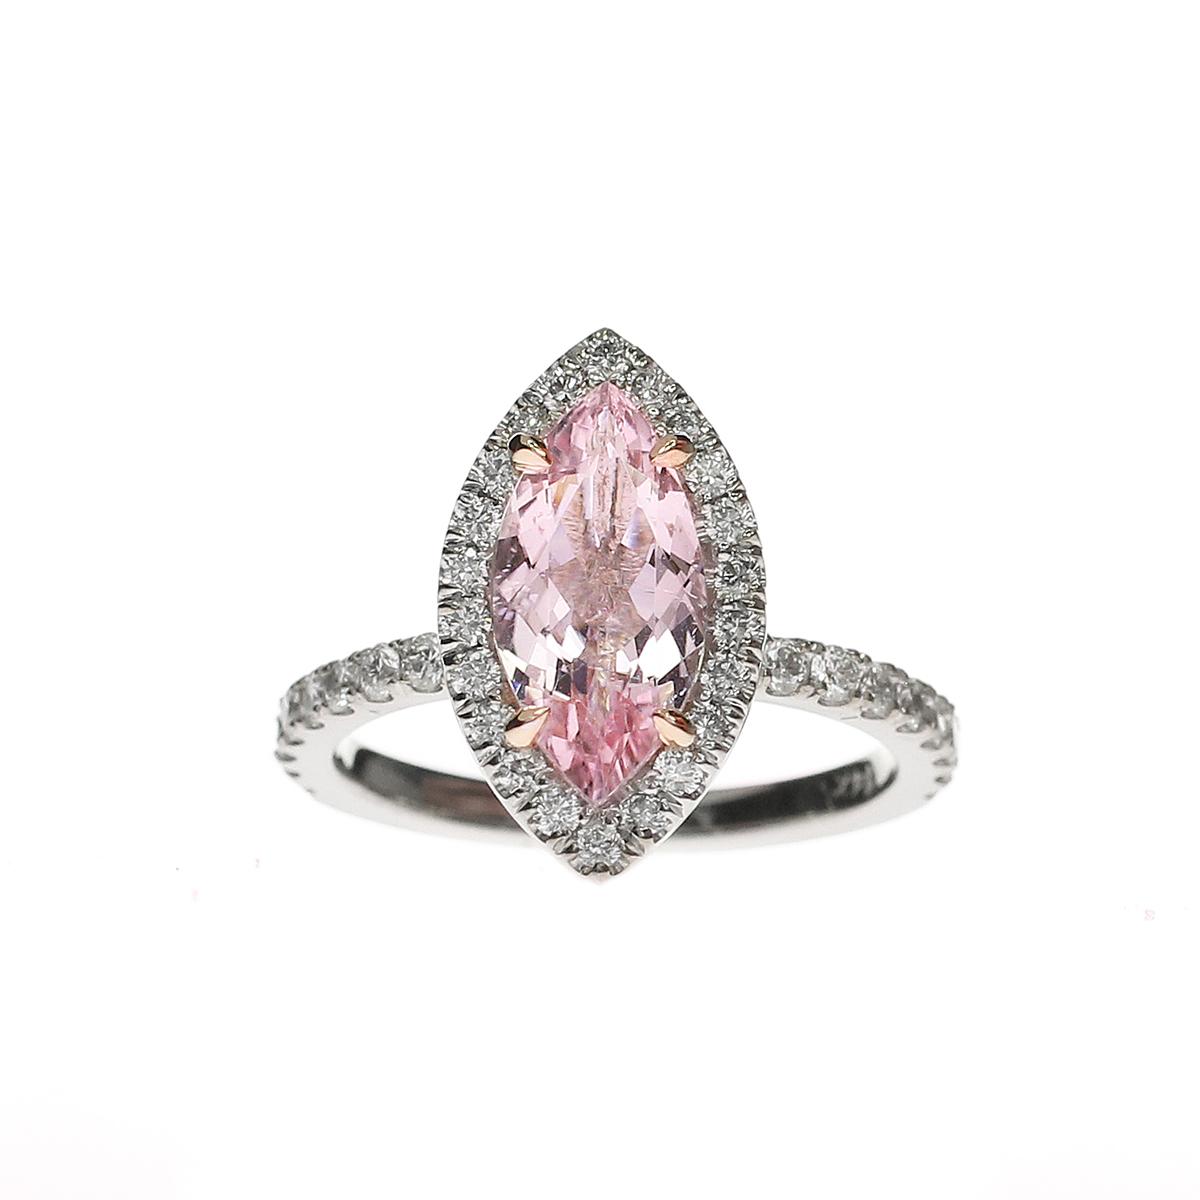 Marquise Cut Pink Morganite Ring Christine K Jewelry